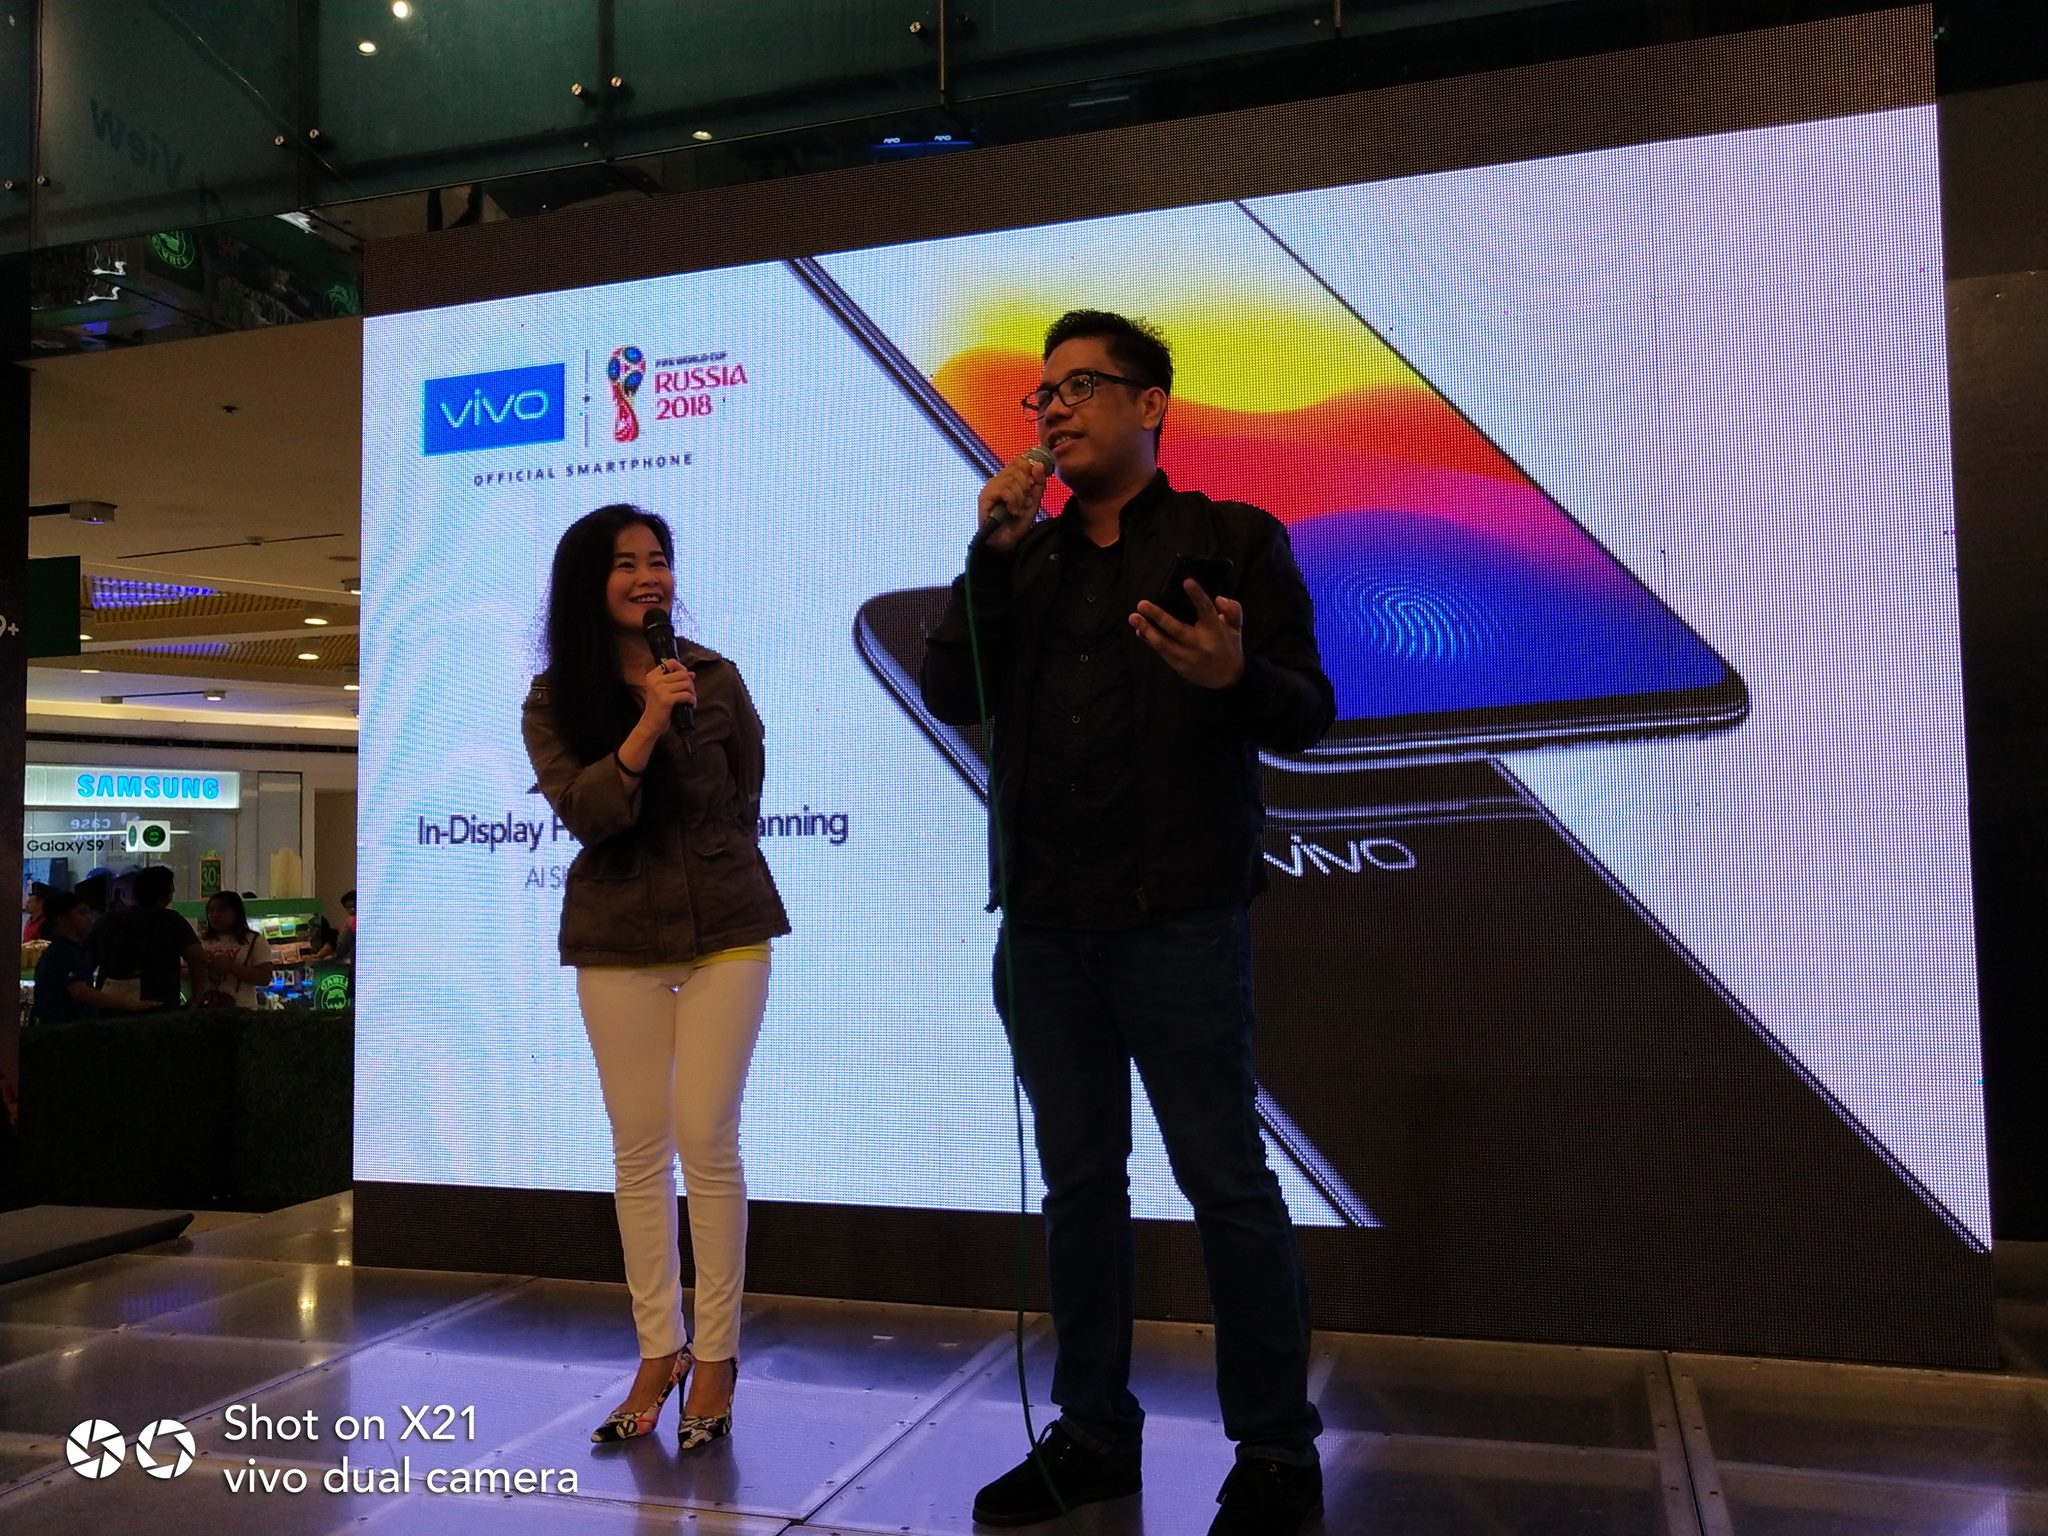 Alora Uy Guerrero of Revu and Mark Macanas of TechPinas